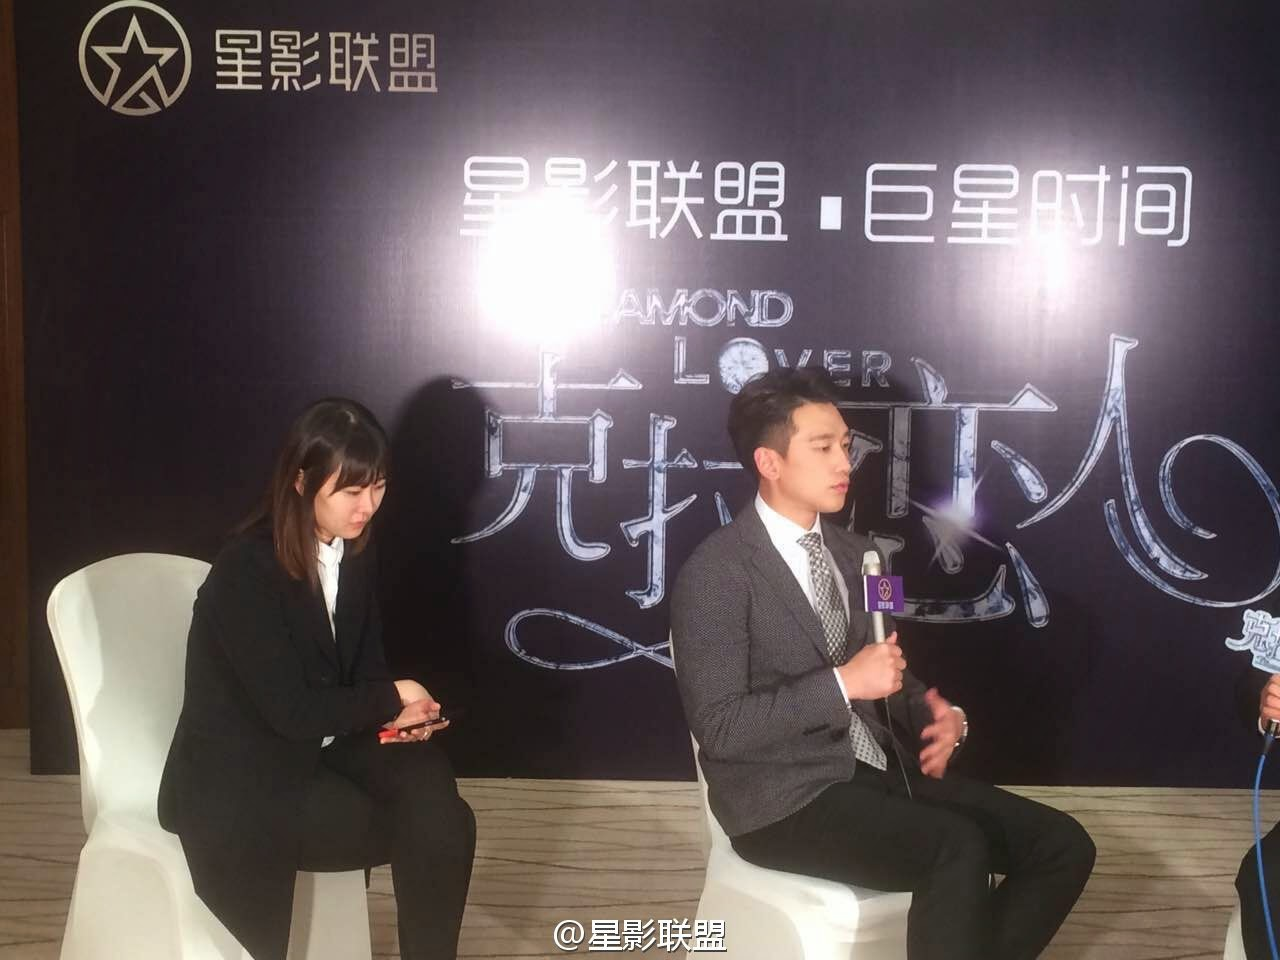 Rain中国ドラマDiamond Lover 記者会見_c0047605_1191755.jpg